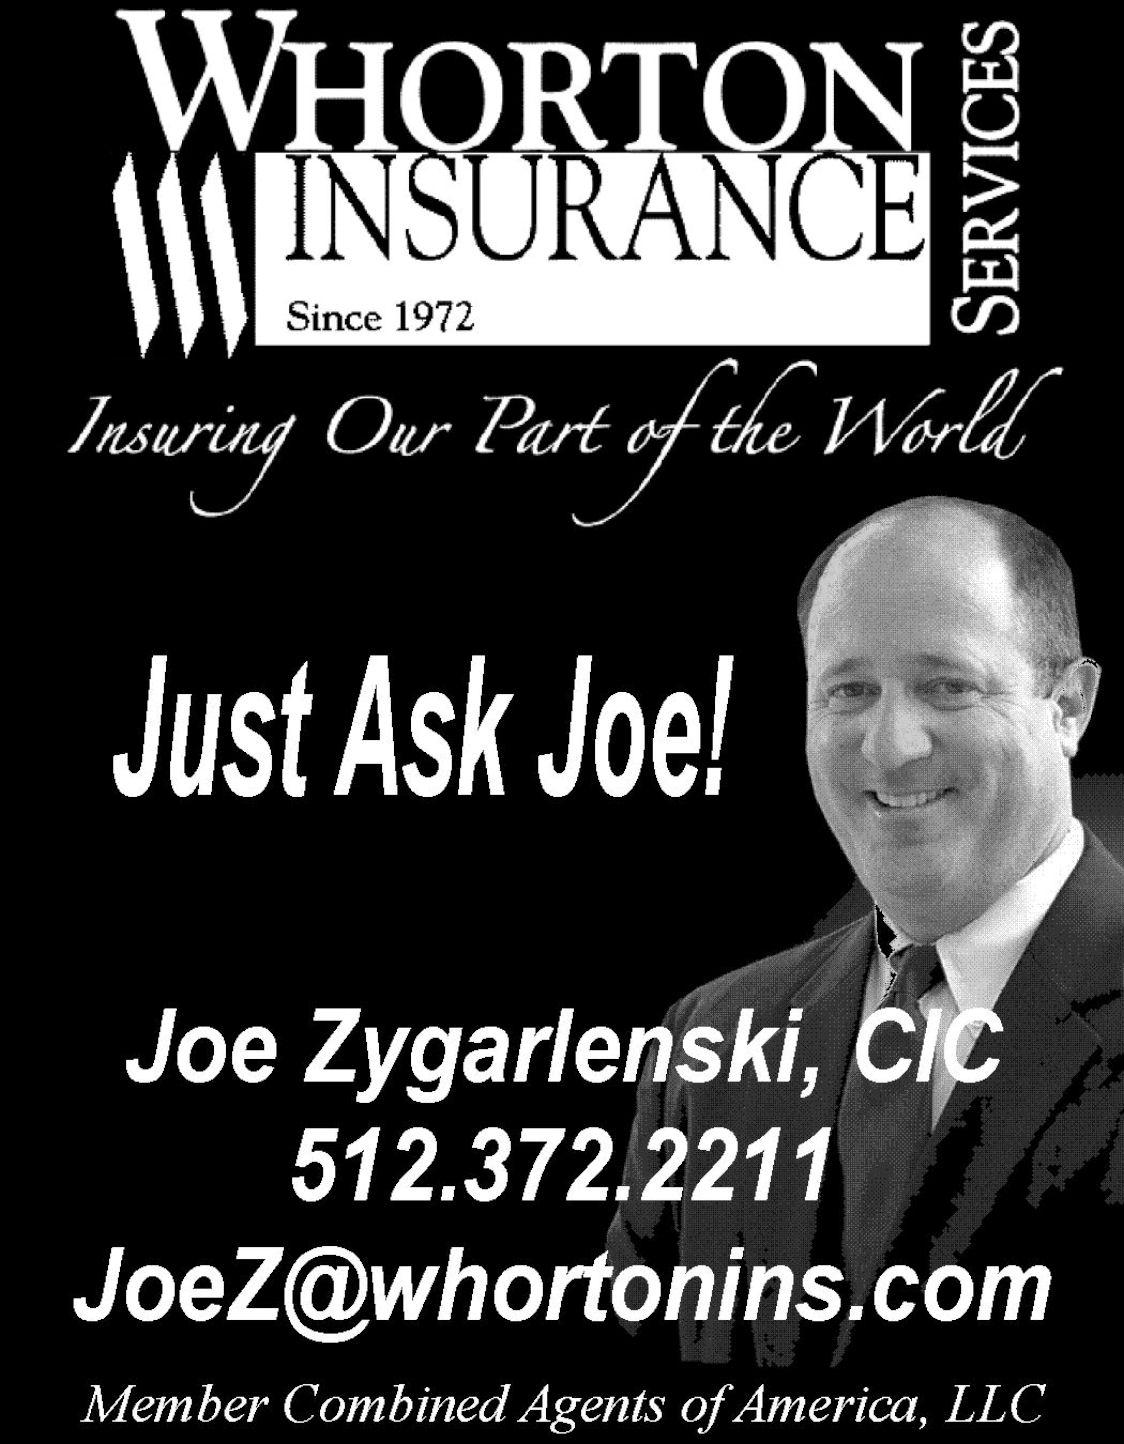 Just Ask Joe